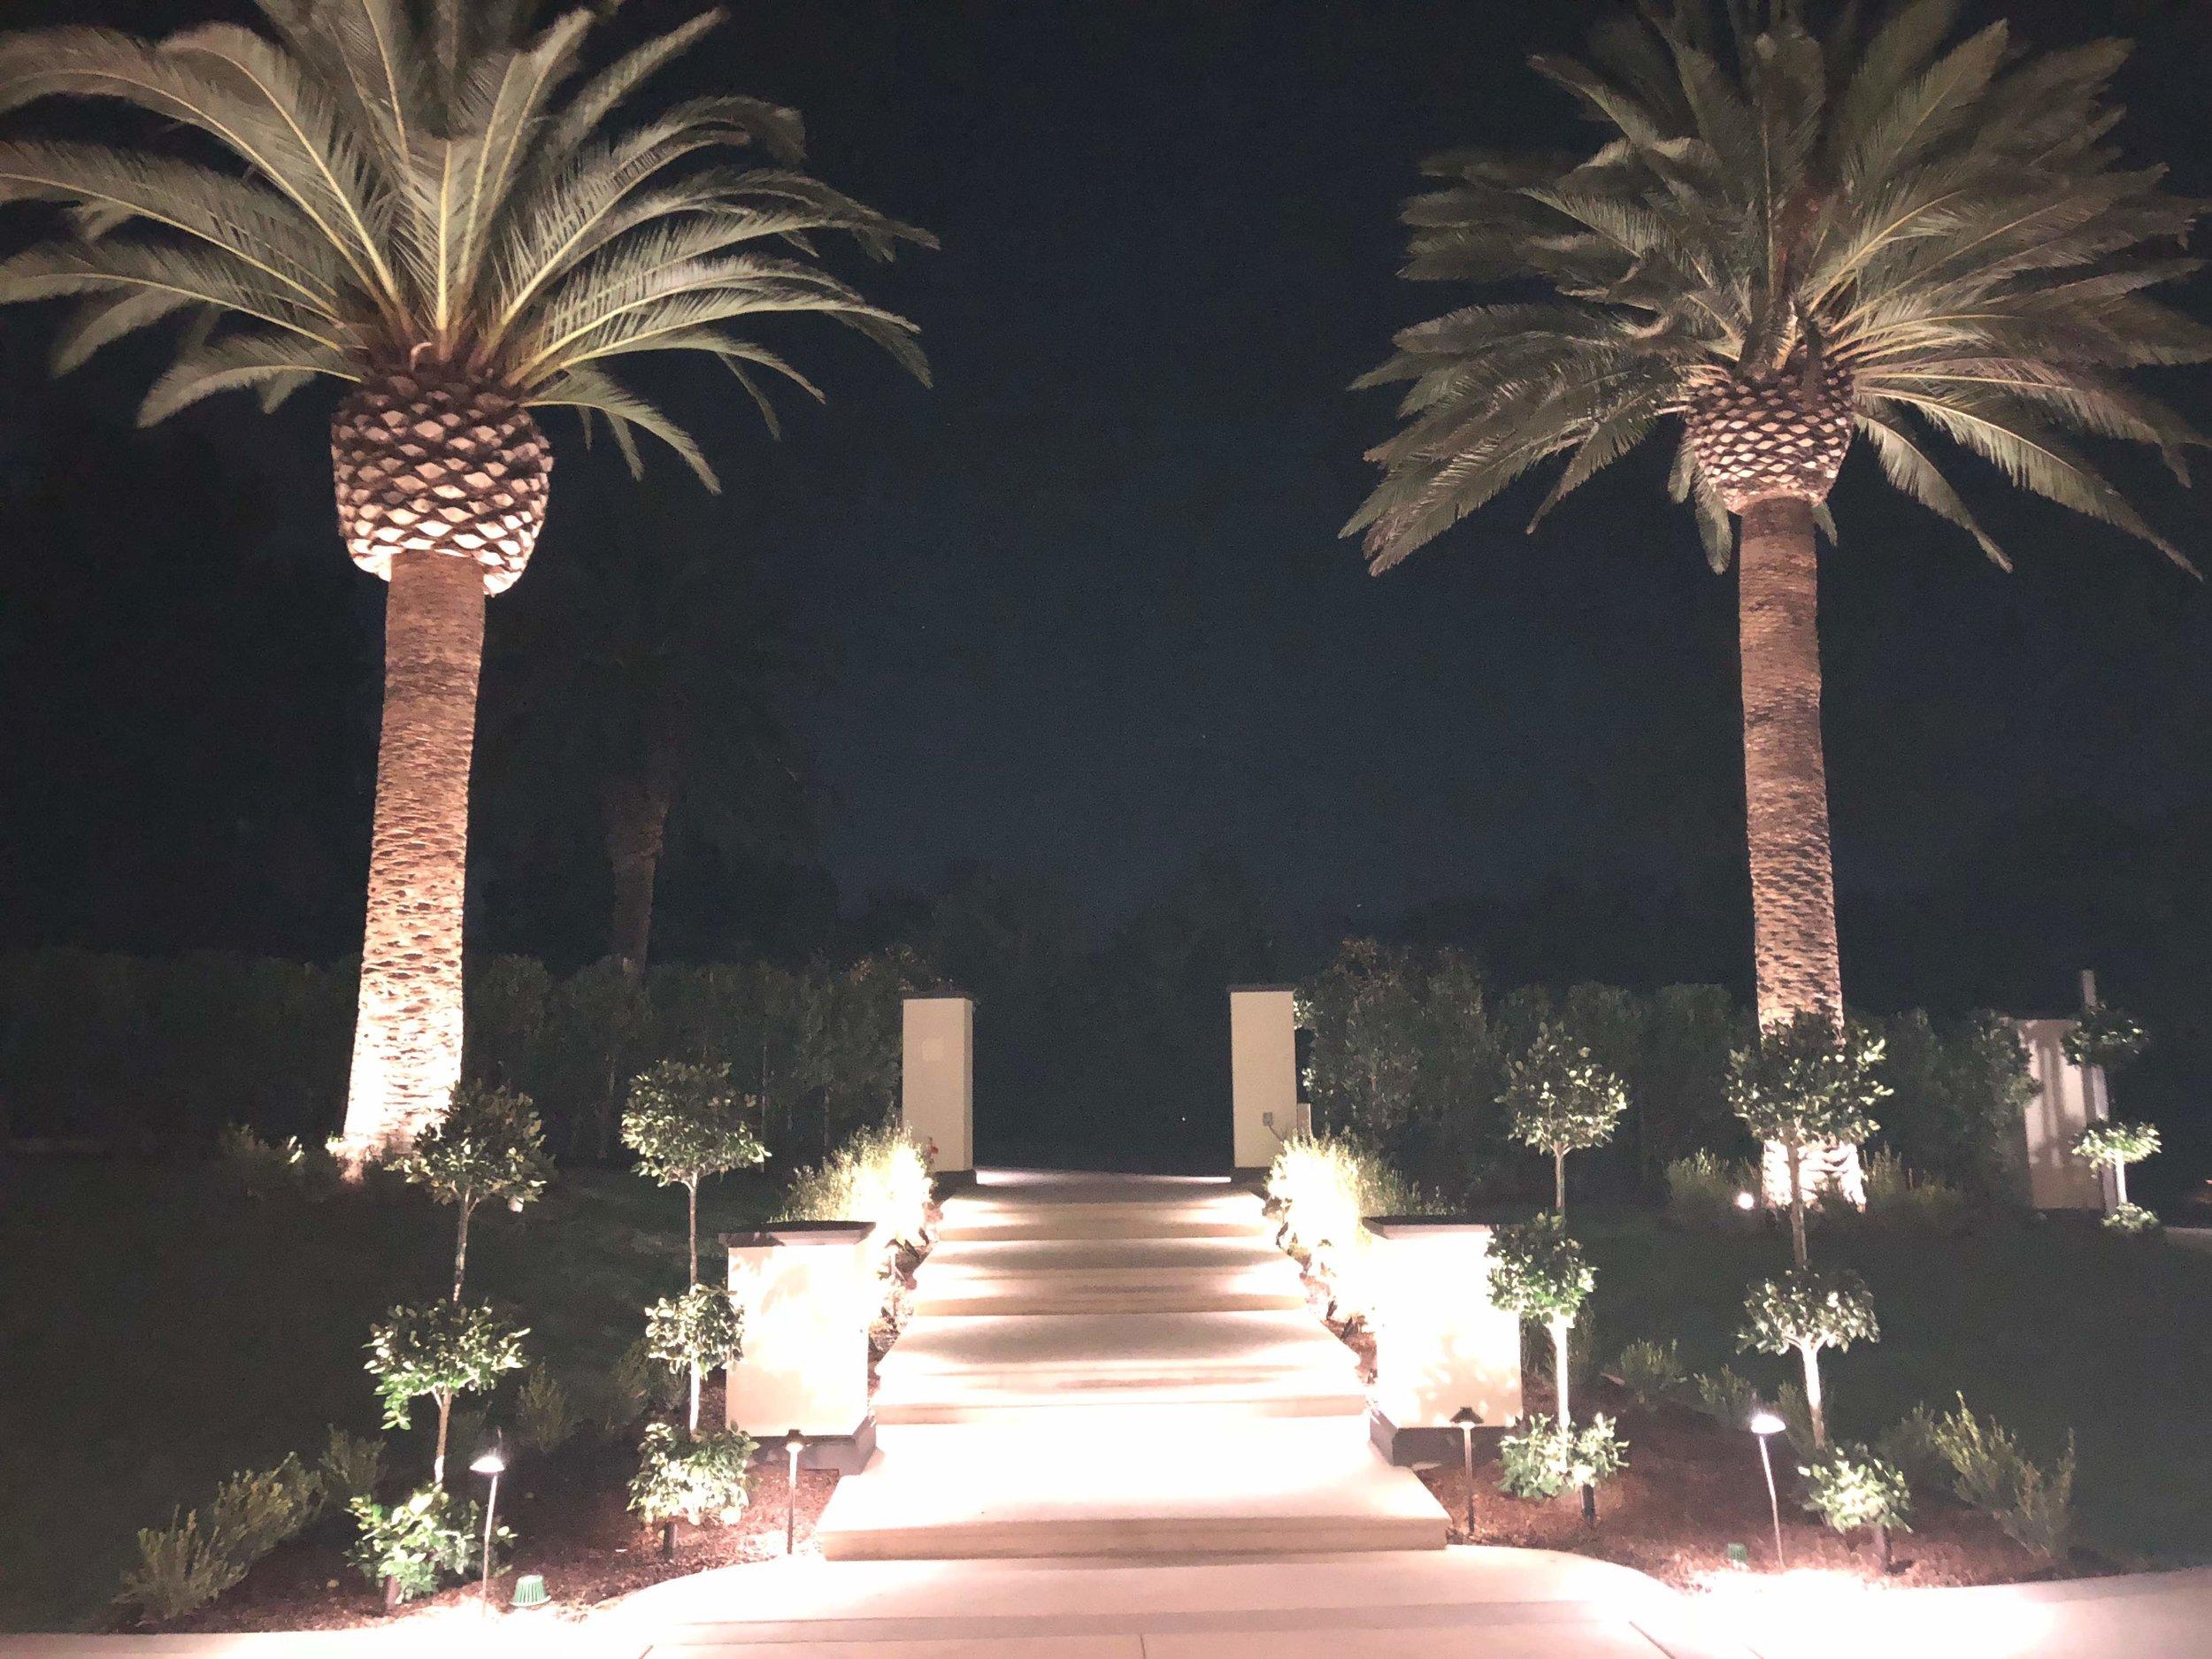 04_Night Pathway.jpg